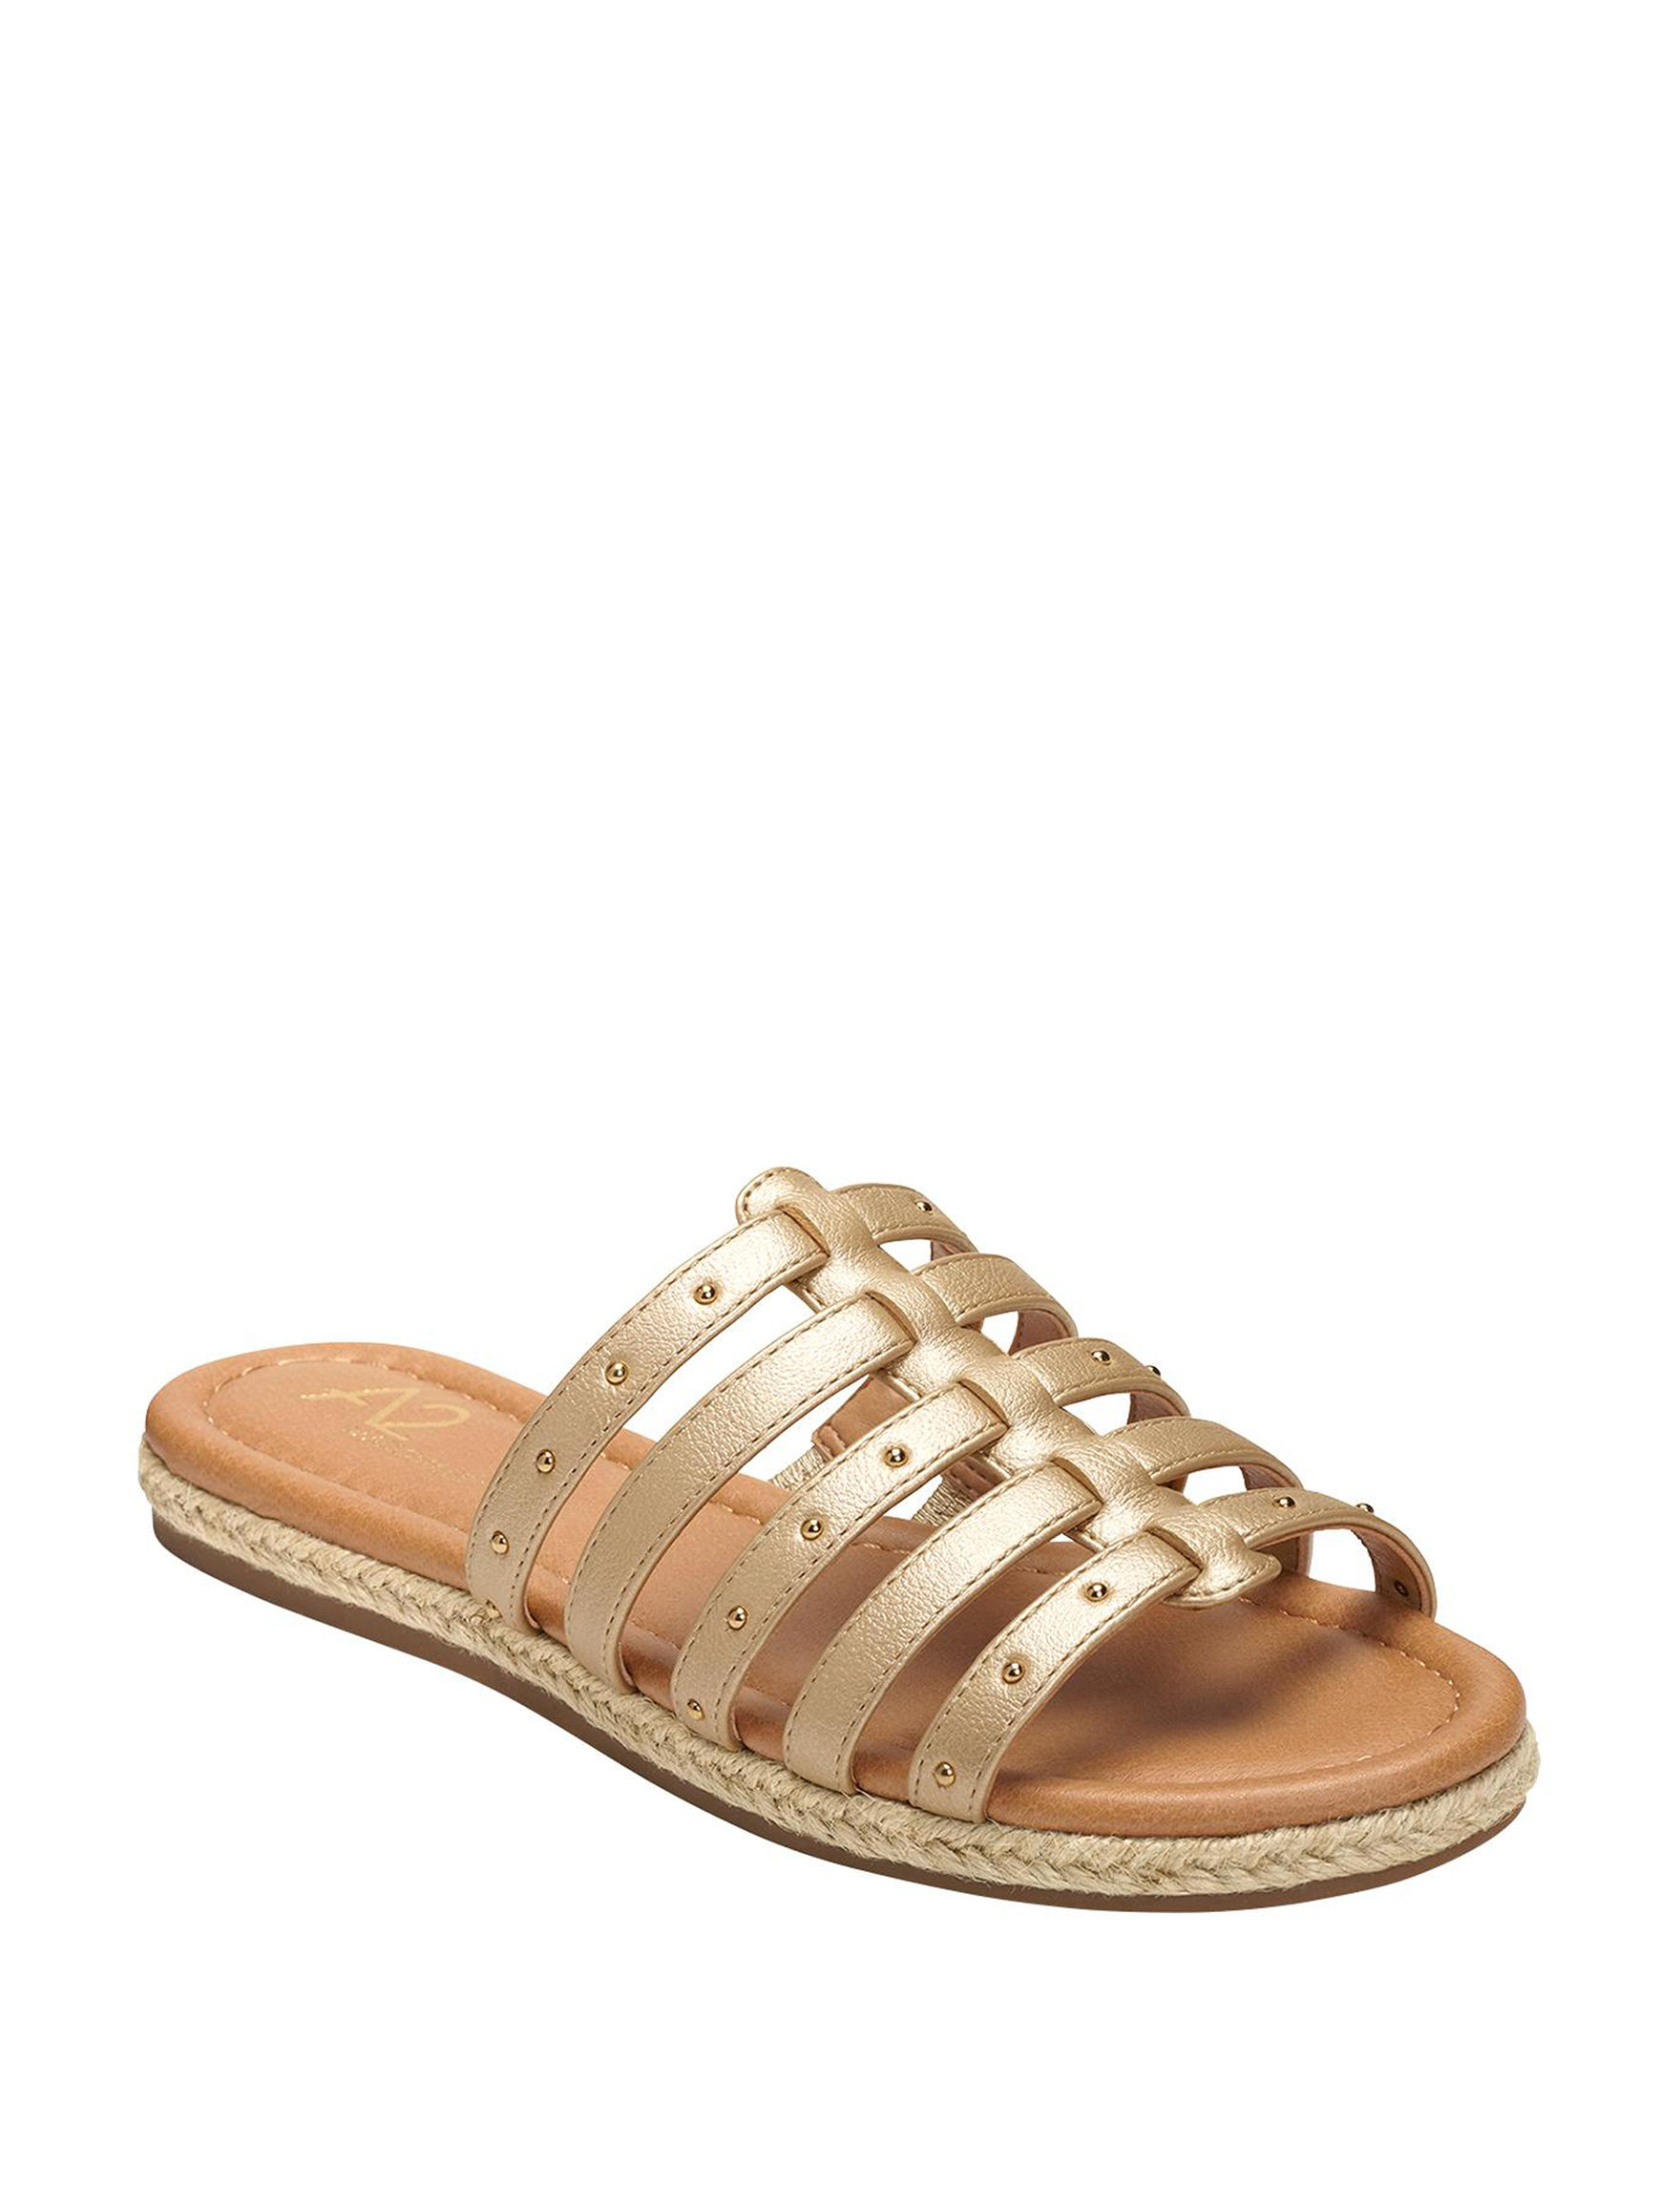 26e1f95efc49 A2 by Aerosoles Women s Drop Top Studded Jute Sandals